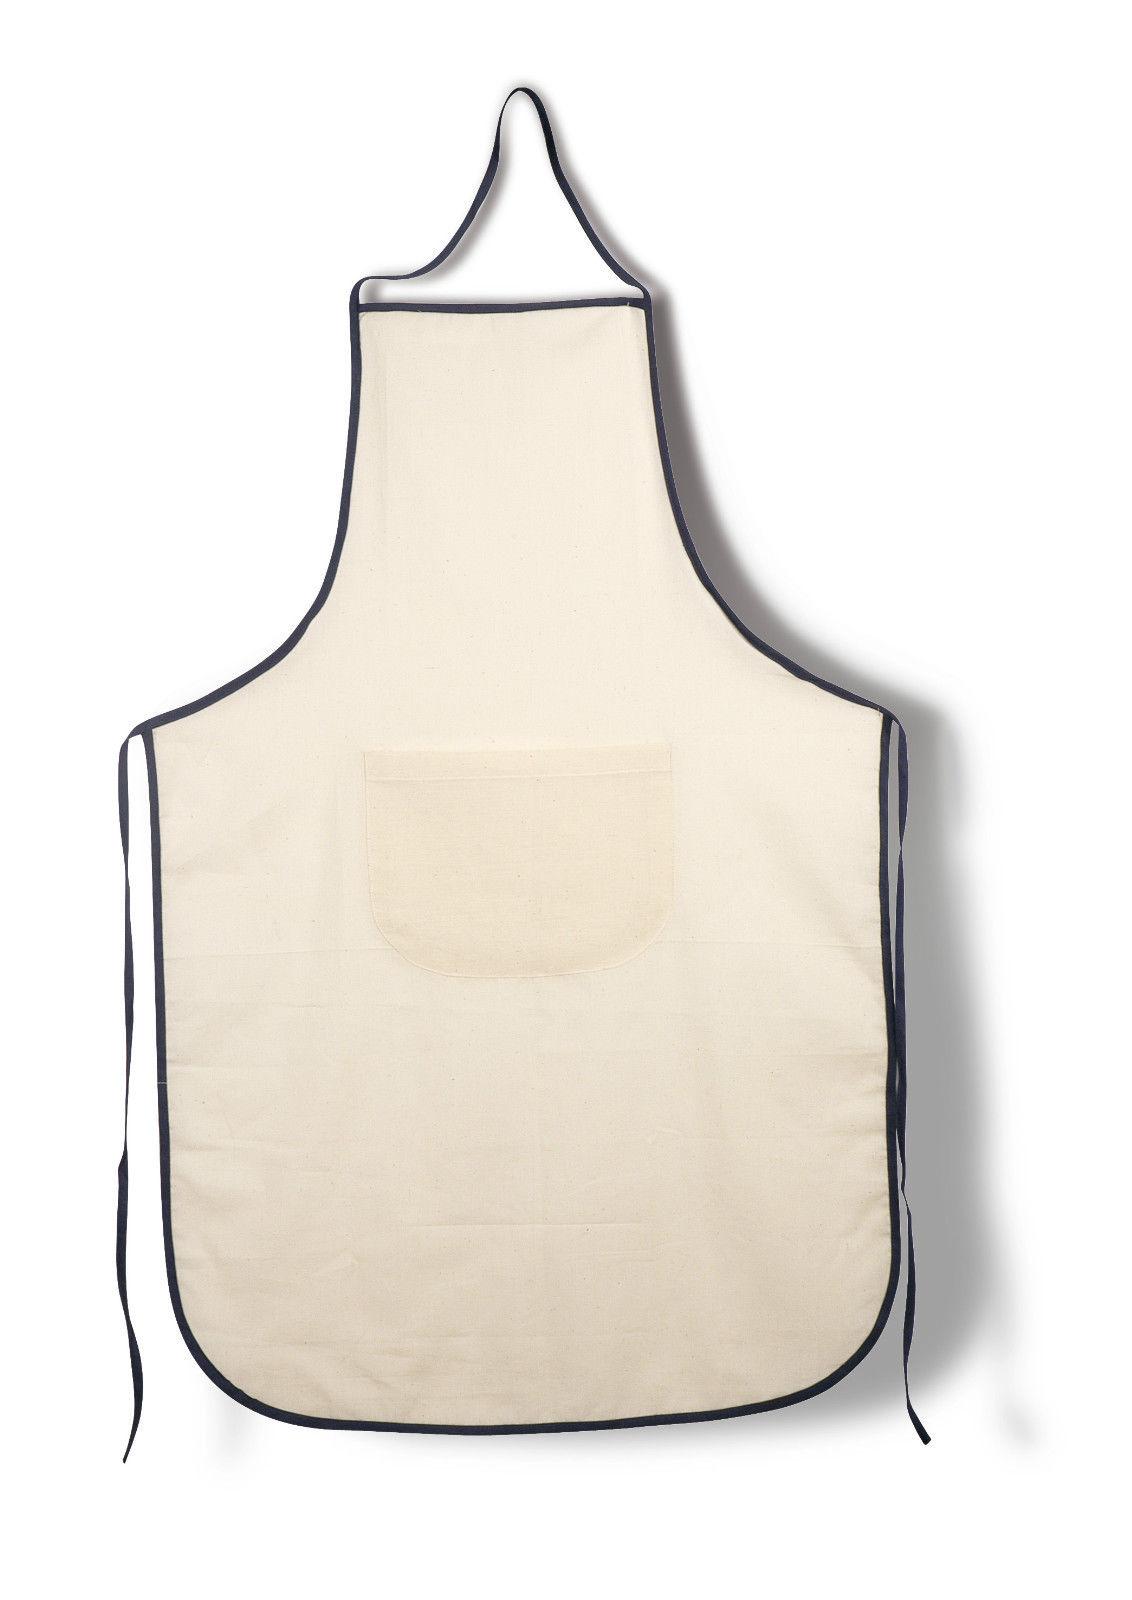 stock 50 grembiuli da cucina chef hobby cucina corsi gadget cucina concorsi fiori a righe utility